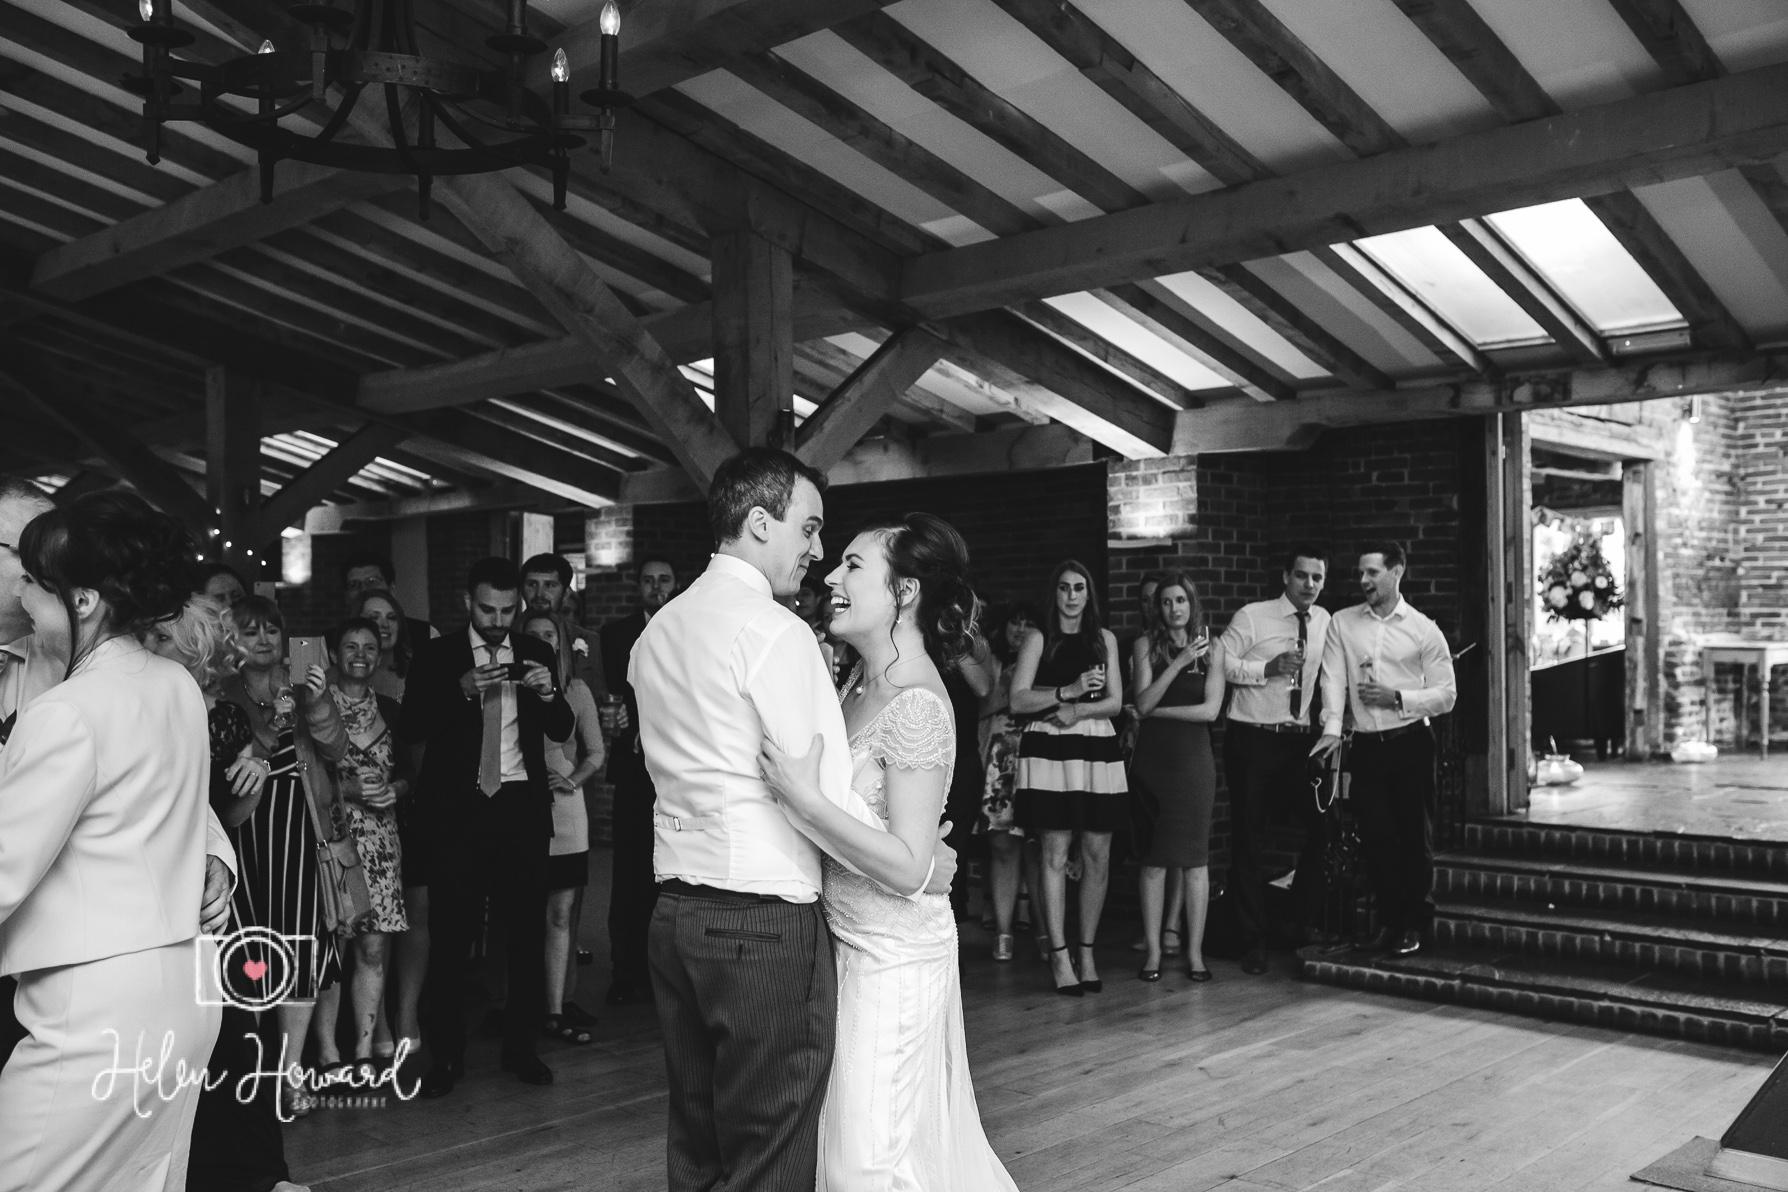 Helen Howard Photography Packington Moor Wedding-120.jpg